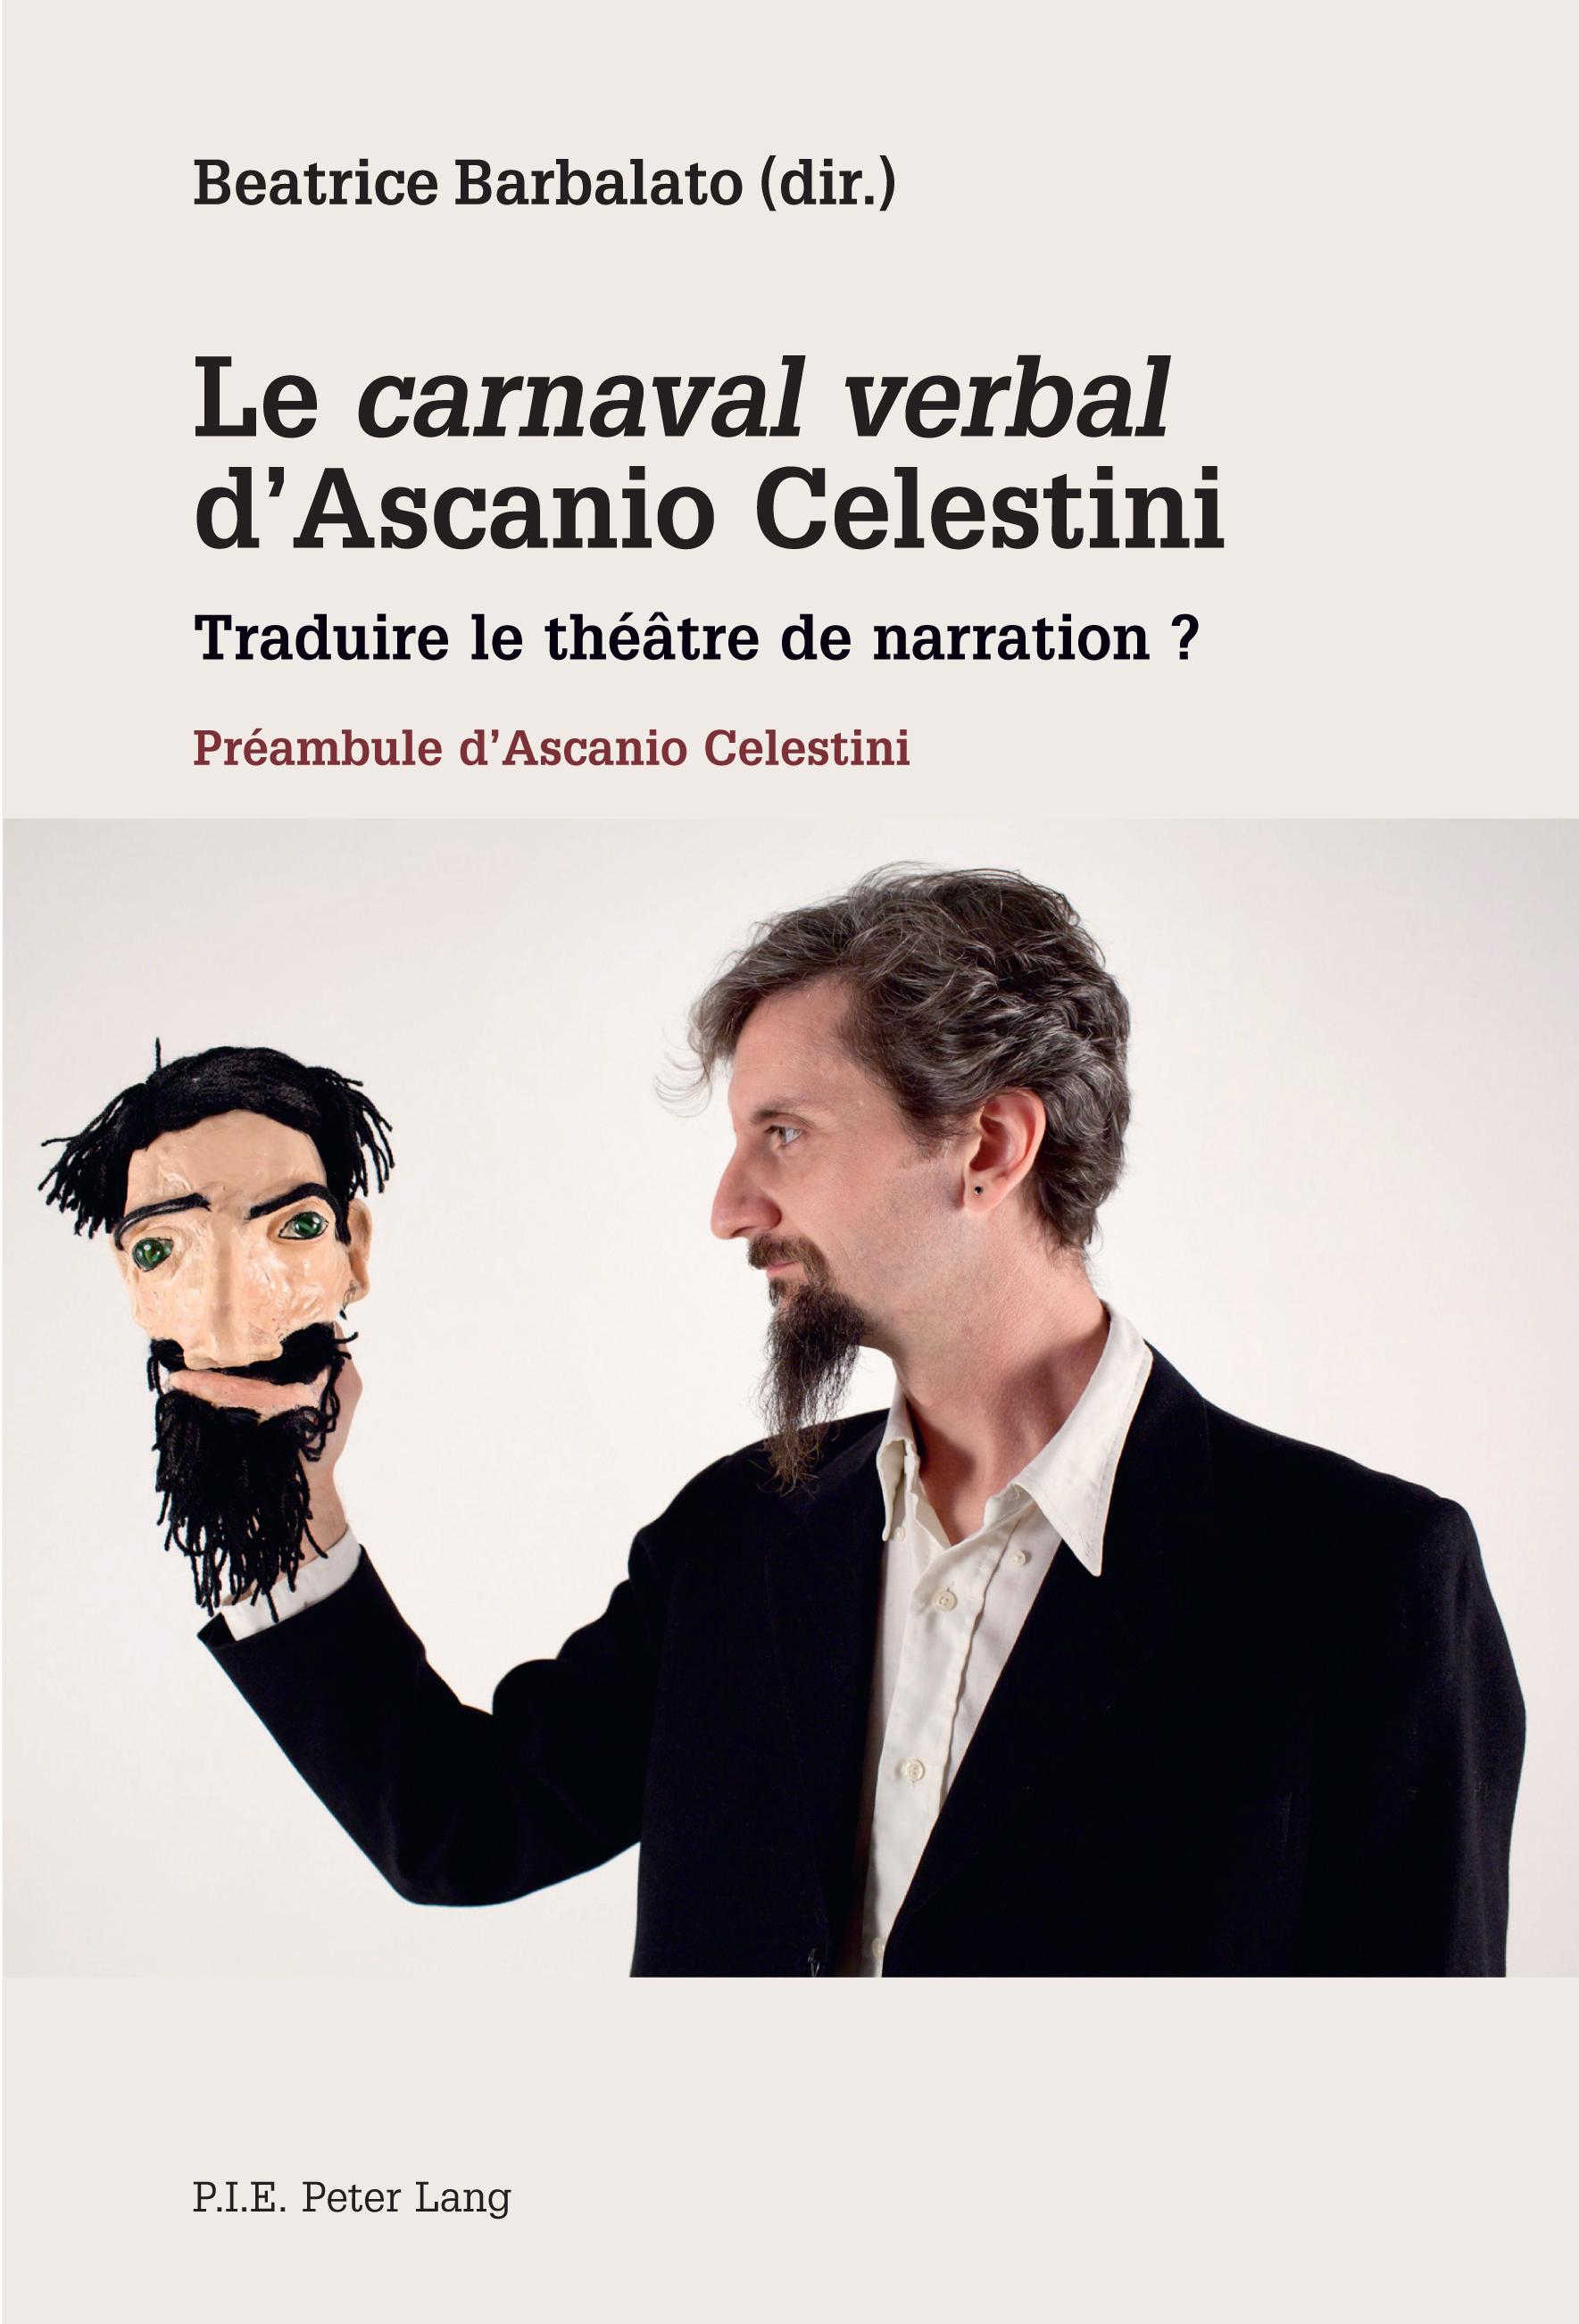 LE CARNAVAL VERBAL D'ASCANIO CELESTINI